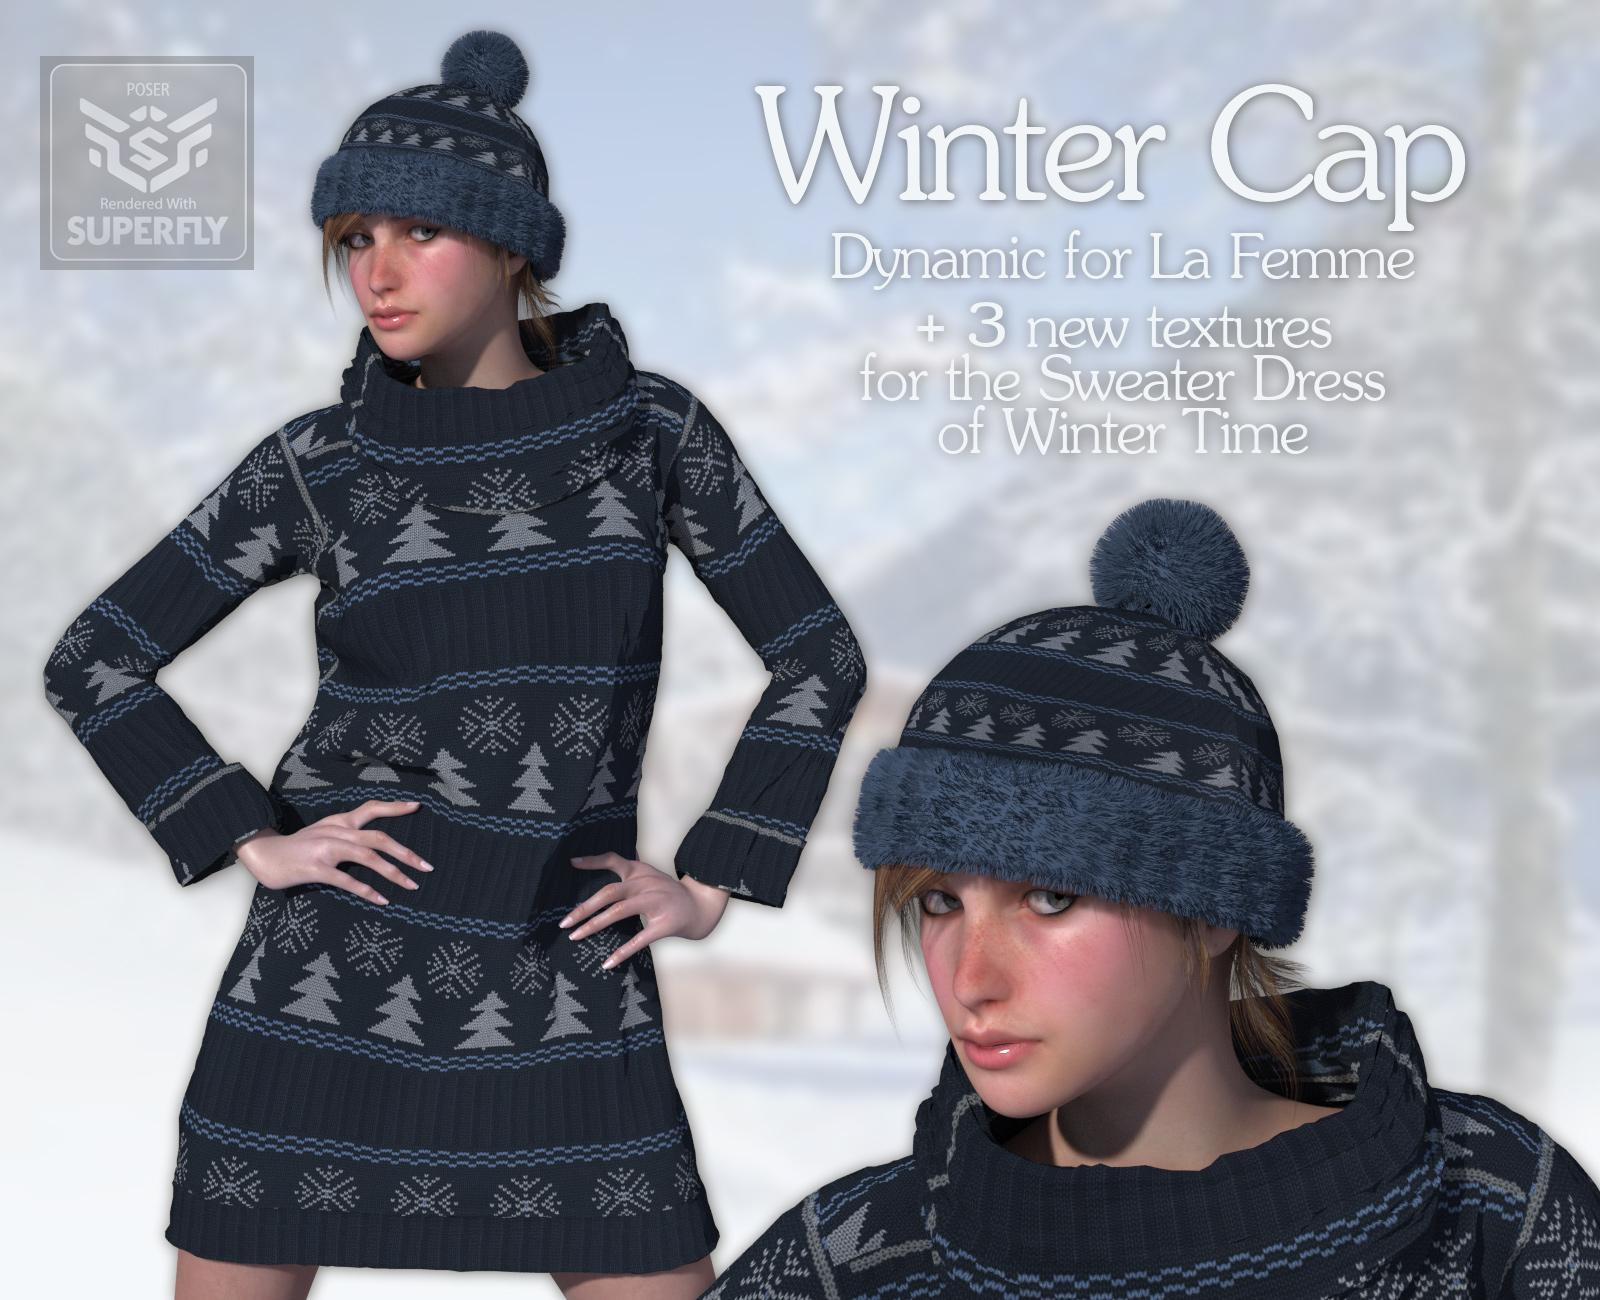 Wintercap promo tete